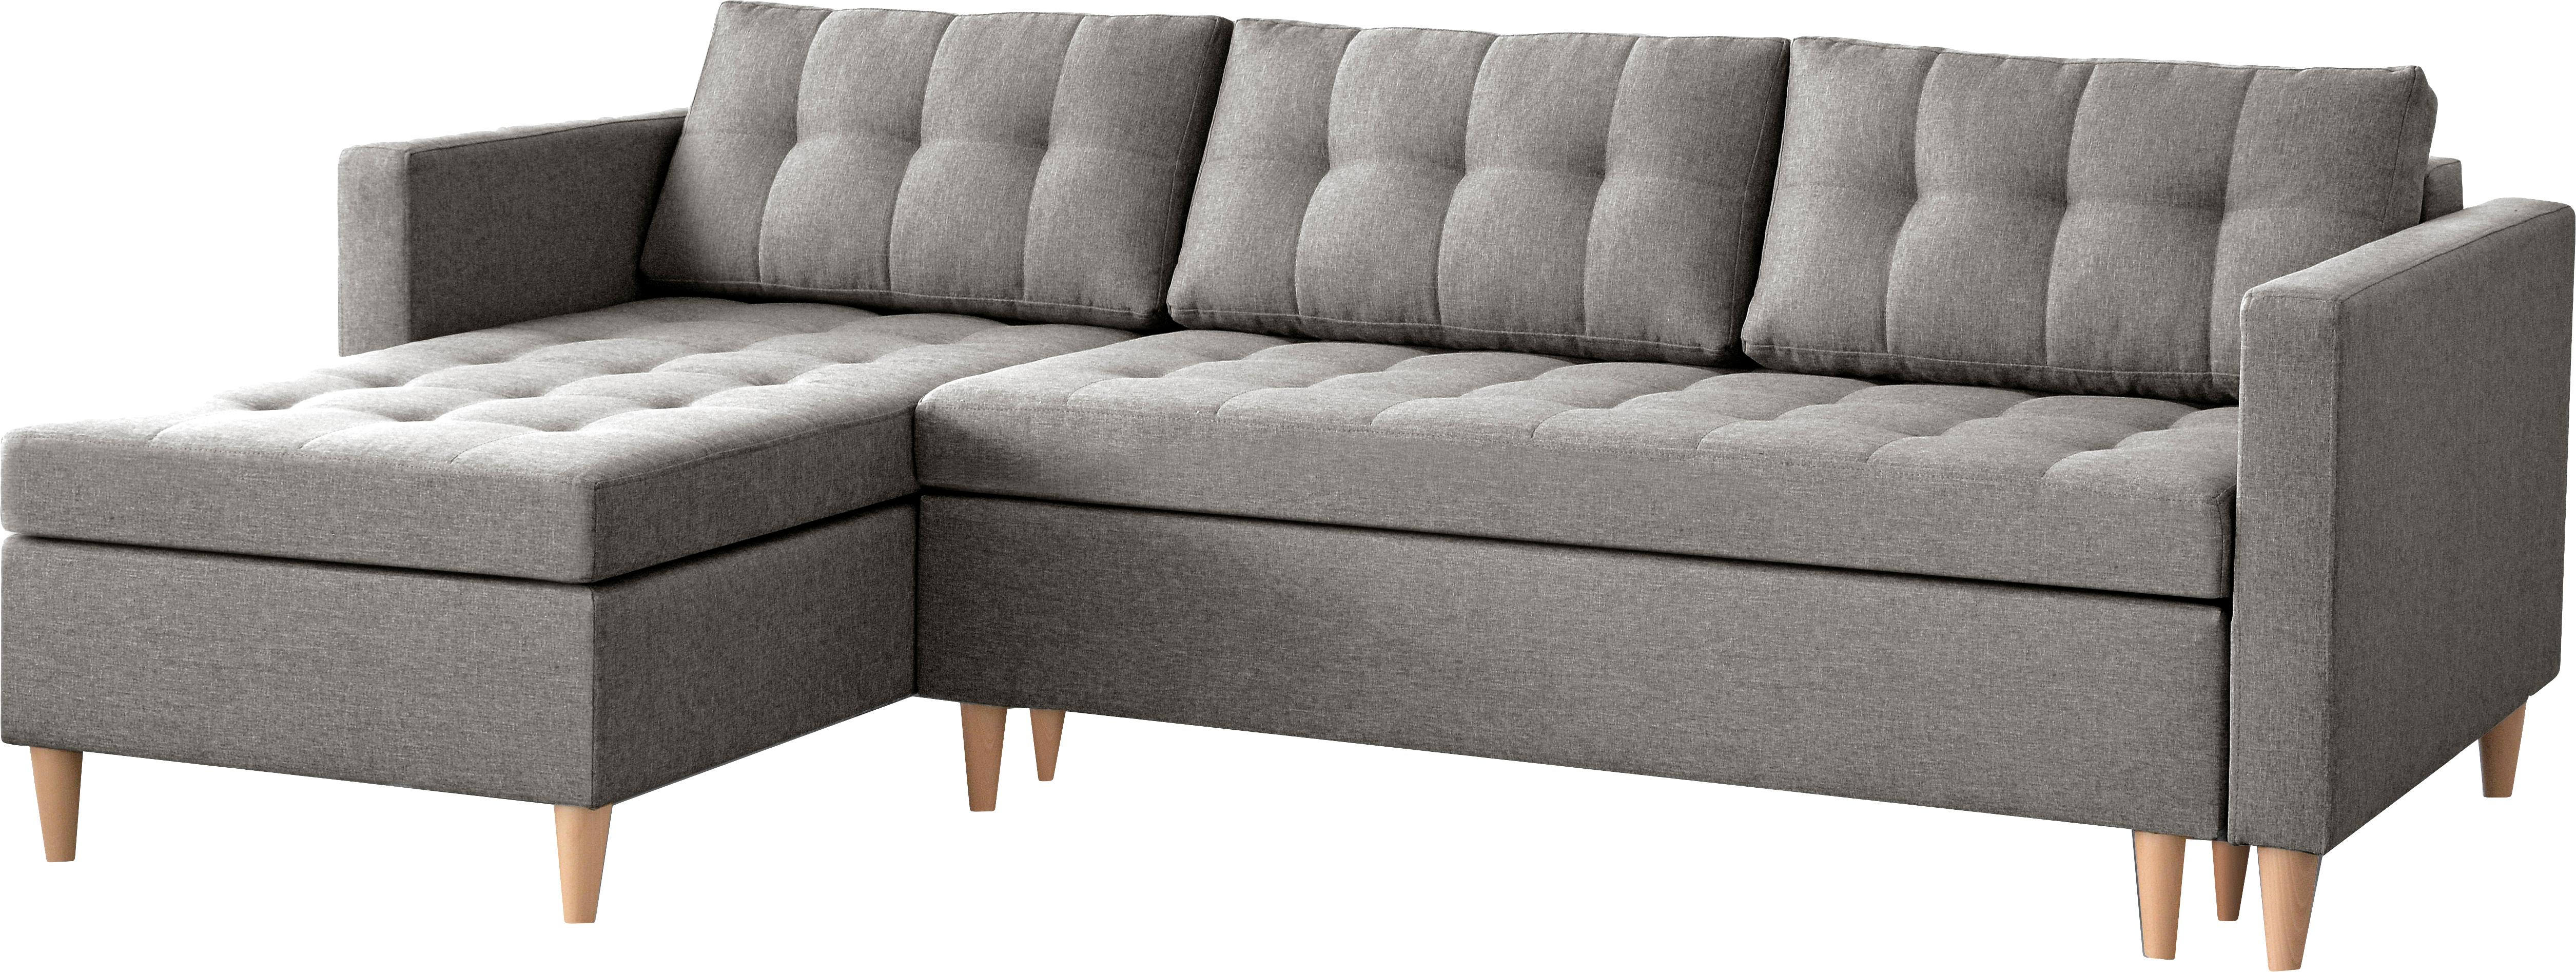 Sofá cama rinconero Fandy, Tapizado: poliéster 100.000ciclos , Estructura: madera maciza, aglomerado, Patas: madera de haya, Tejido gris claro, An 223 x F 69 cm